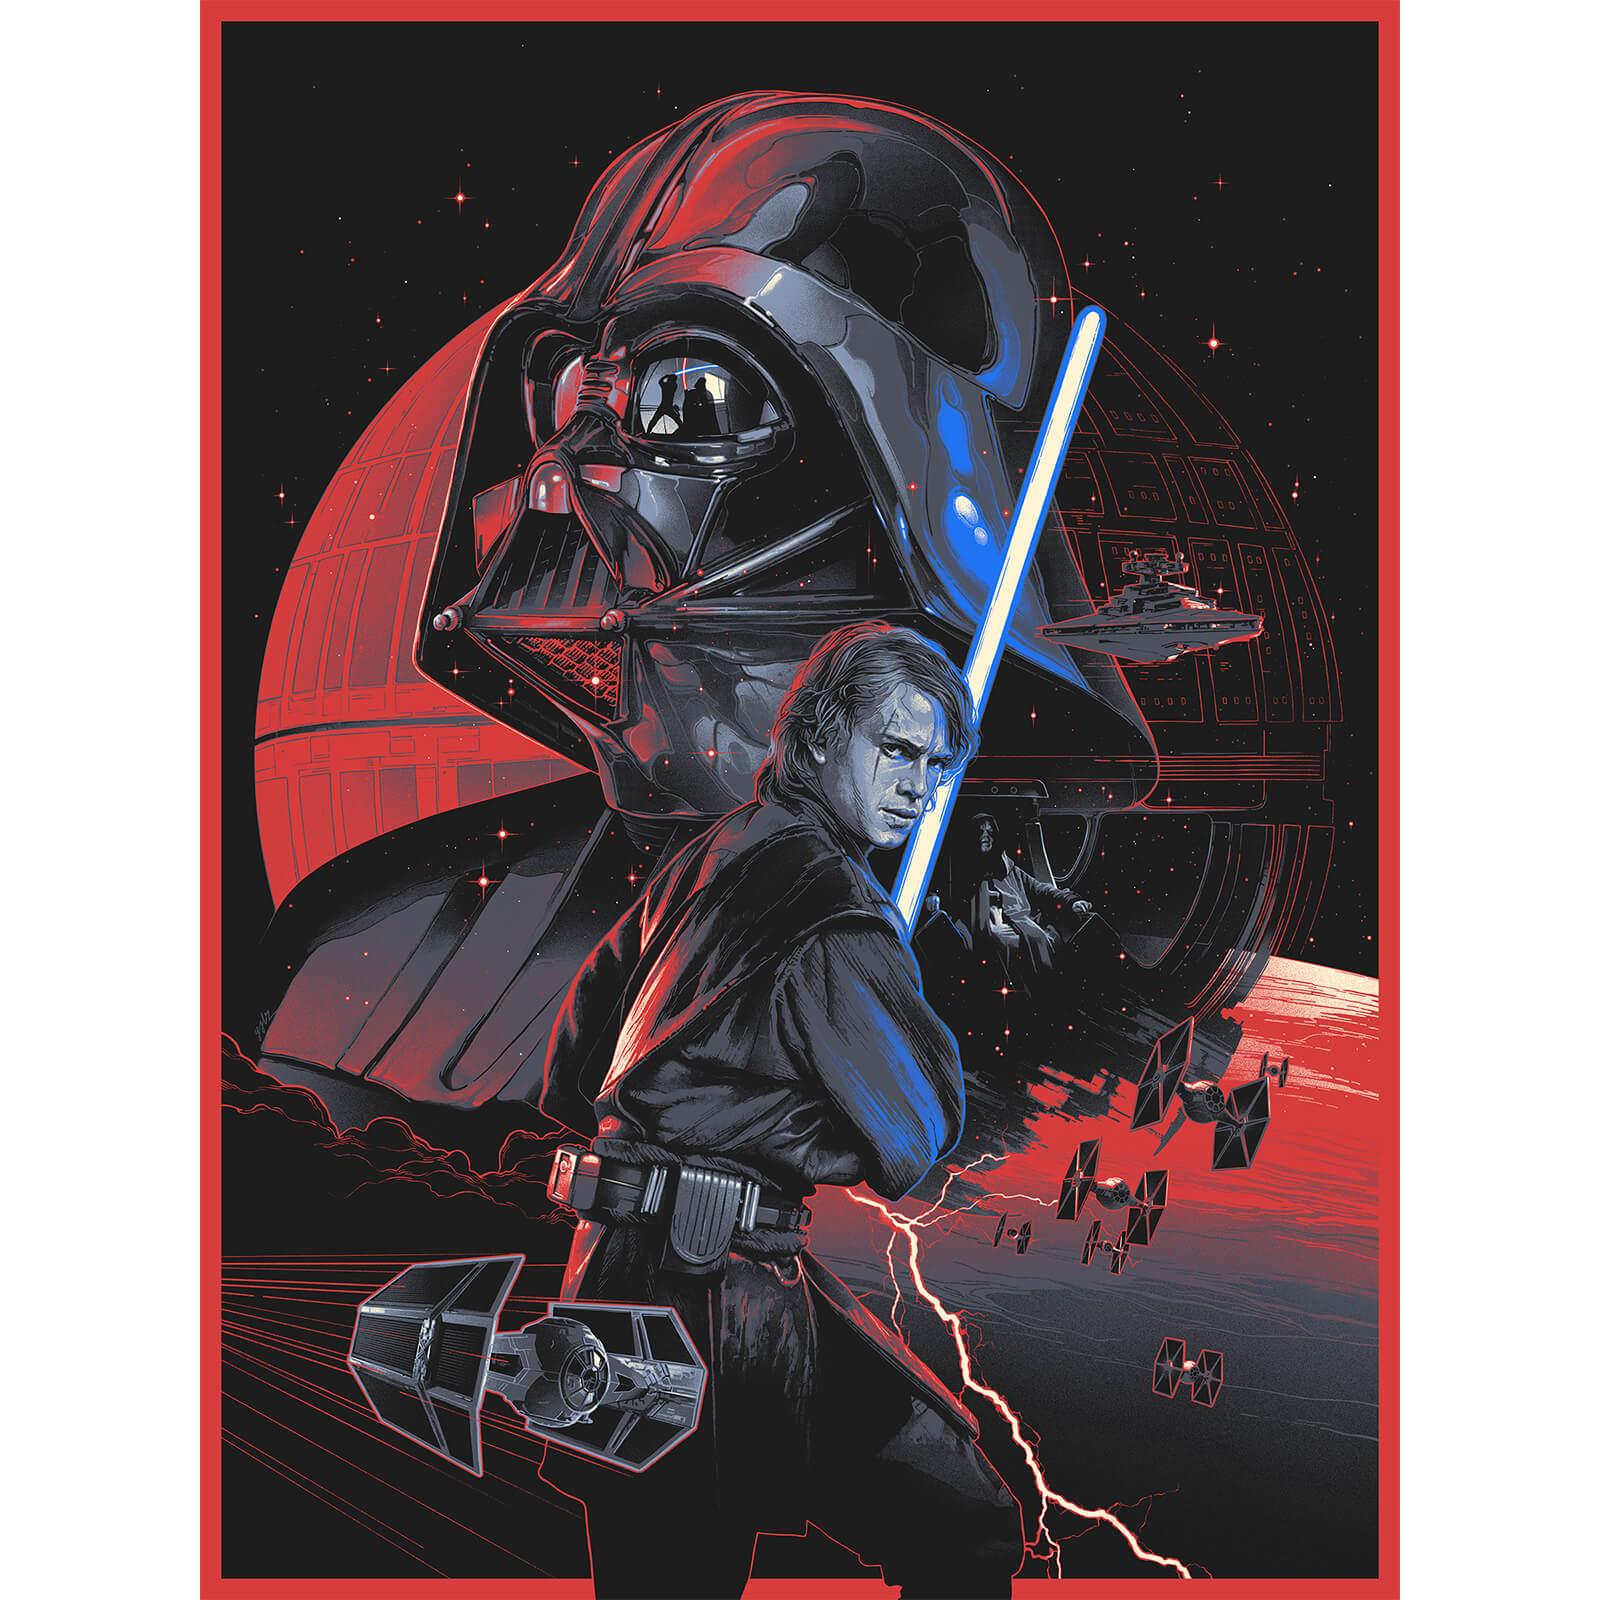 Star Wars Revenge Of The Sith Anakin S Path Silkscreen Print By Gabz 18 X 24 Zavvi Uk Exclusive Timed Sale Merchandise Zavvi Us